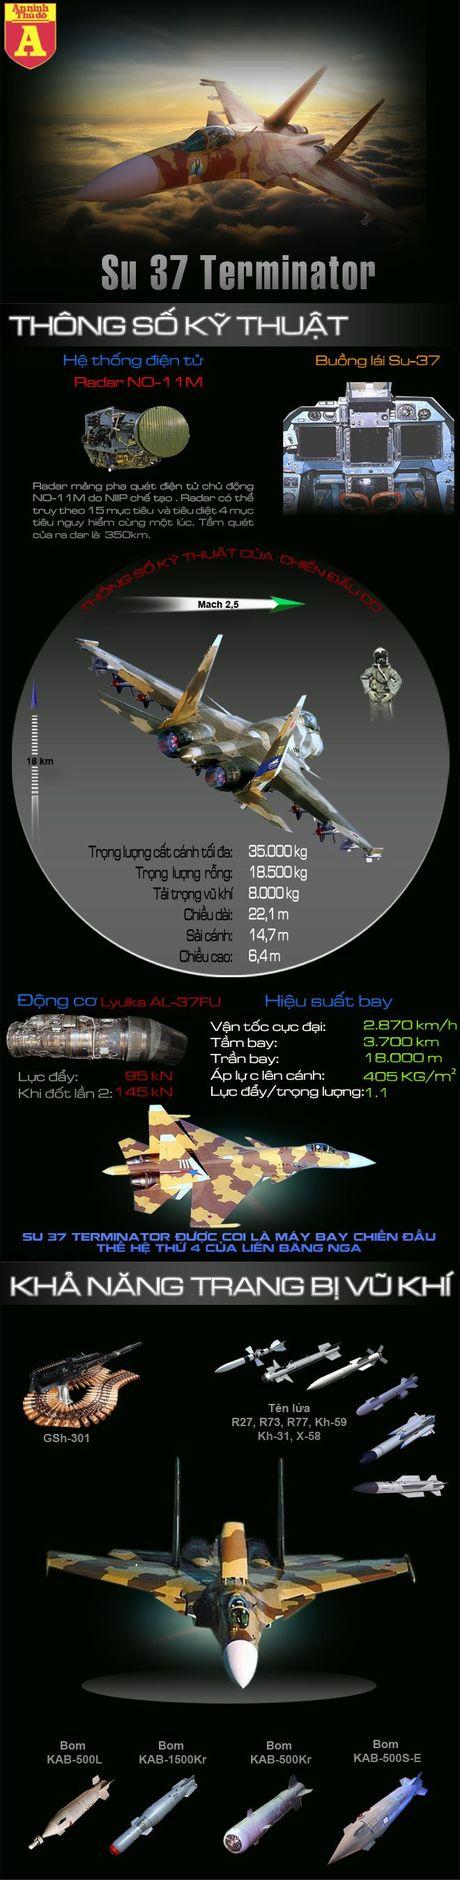 Su tro lai bau troi cua 'ke huy diet' Su-37 - Anh 2